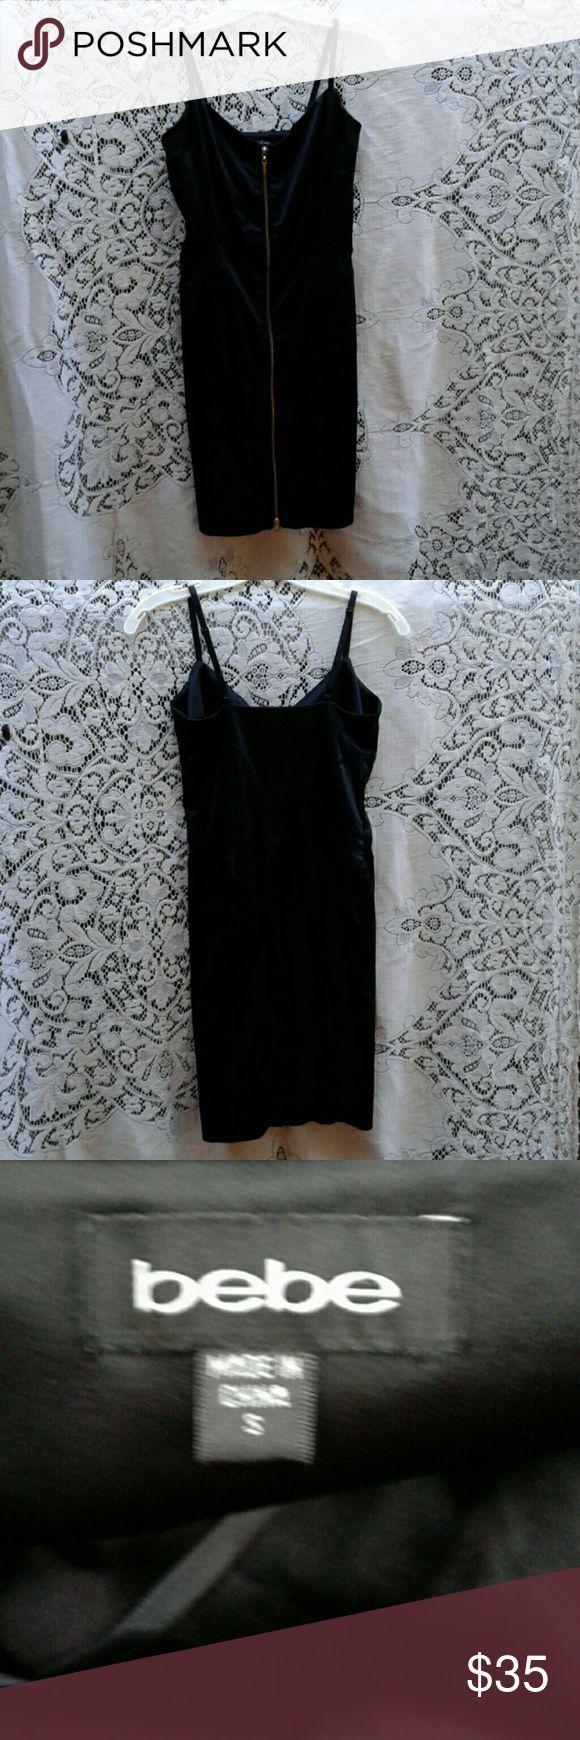 Selling this BEBE BLACK SPAGHETTI STRAP ZIP FRONT DRESS on Poshmark! My username is: msplf1949. #shopmycloset #poshmark #fashion #shopping #style #forsale #BEBE #Dresses & Skirts